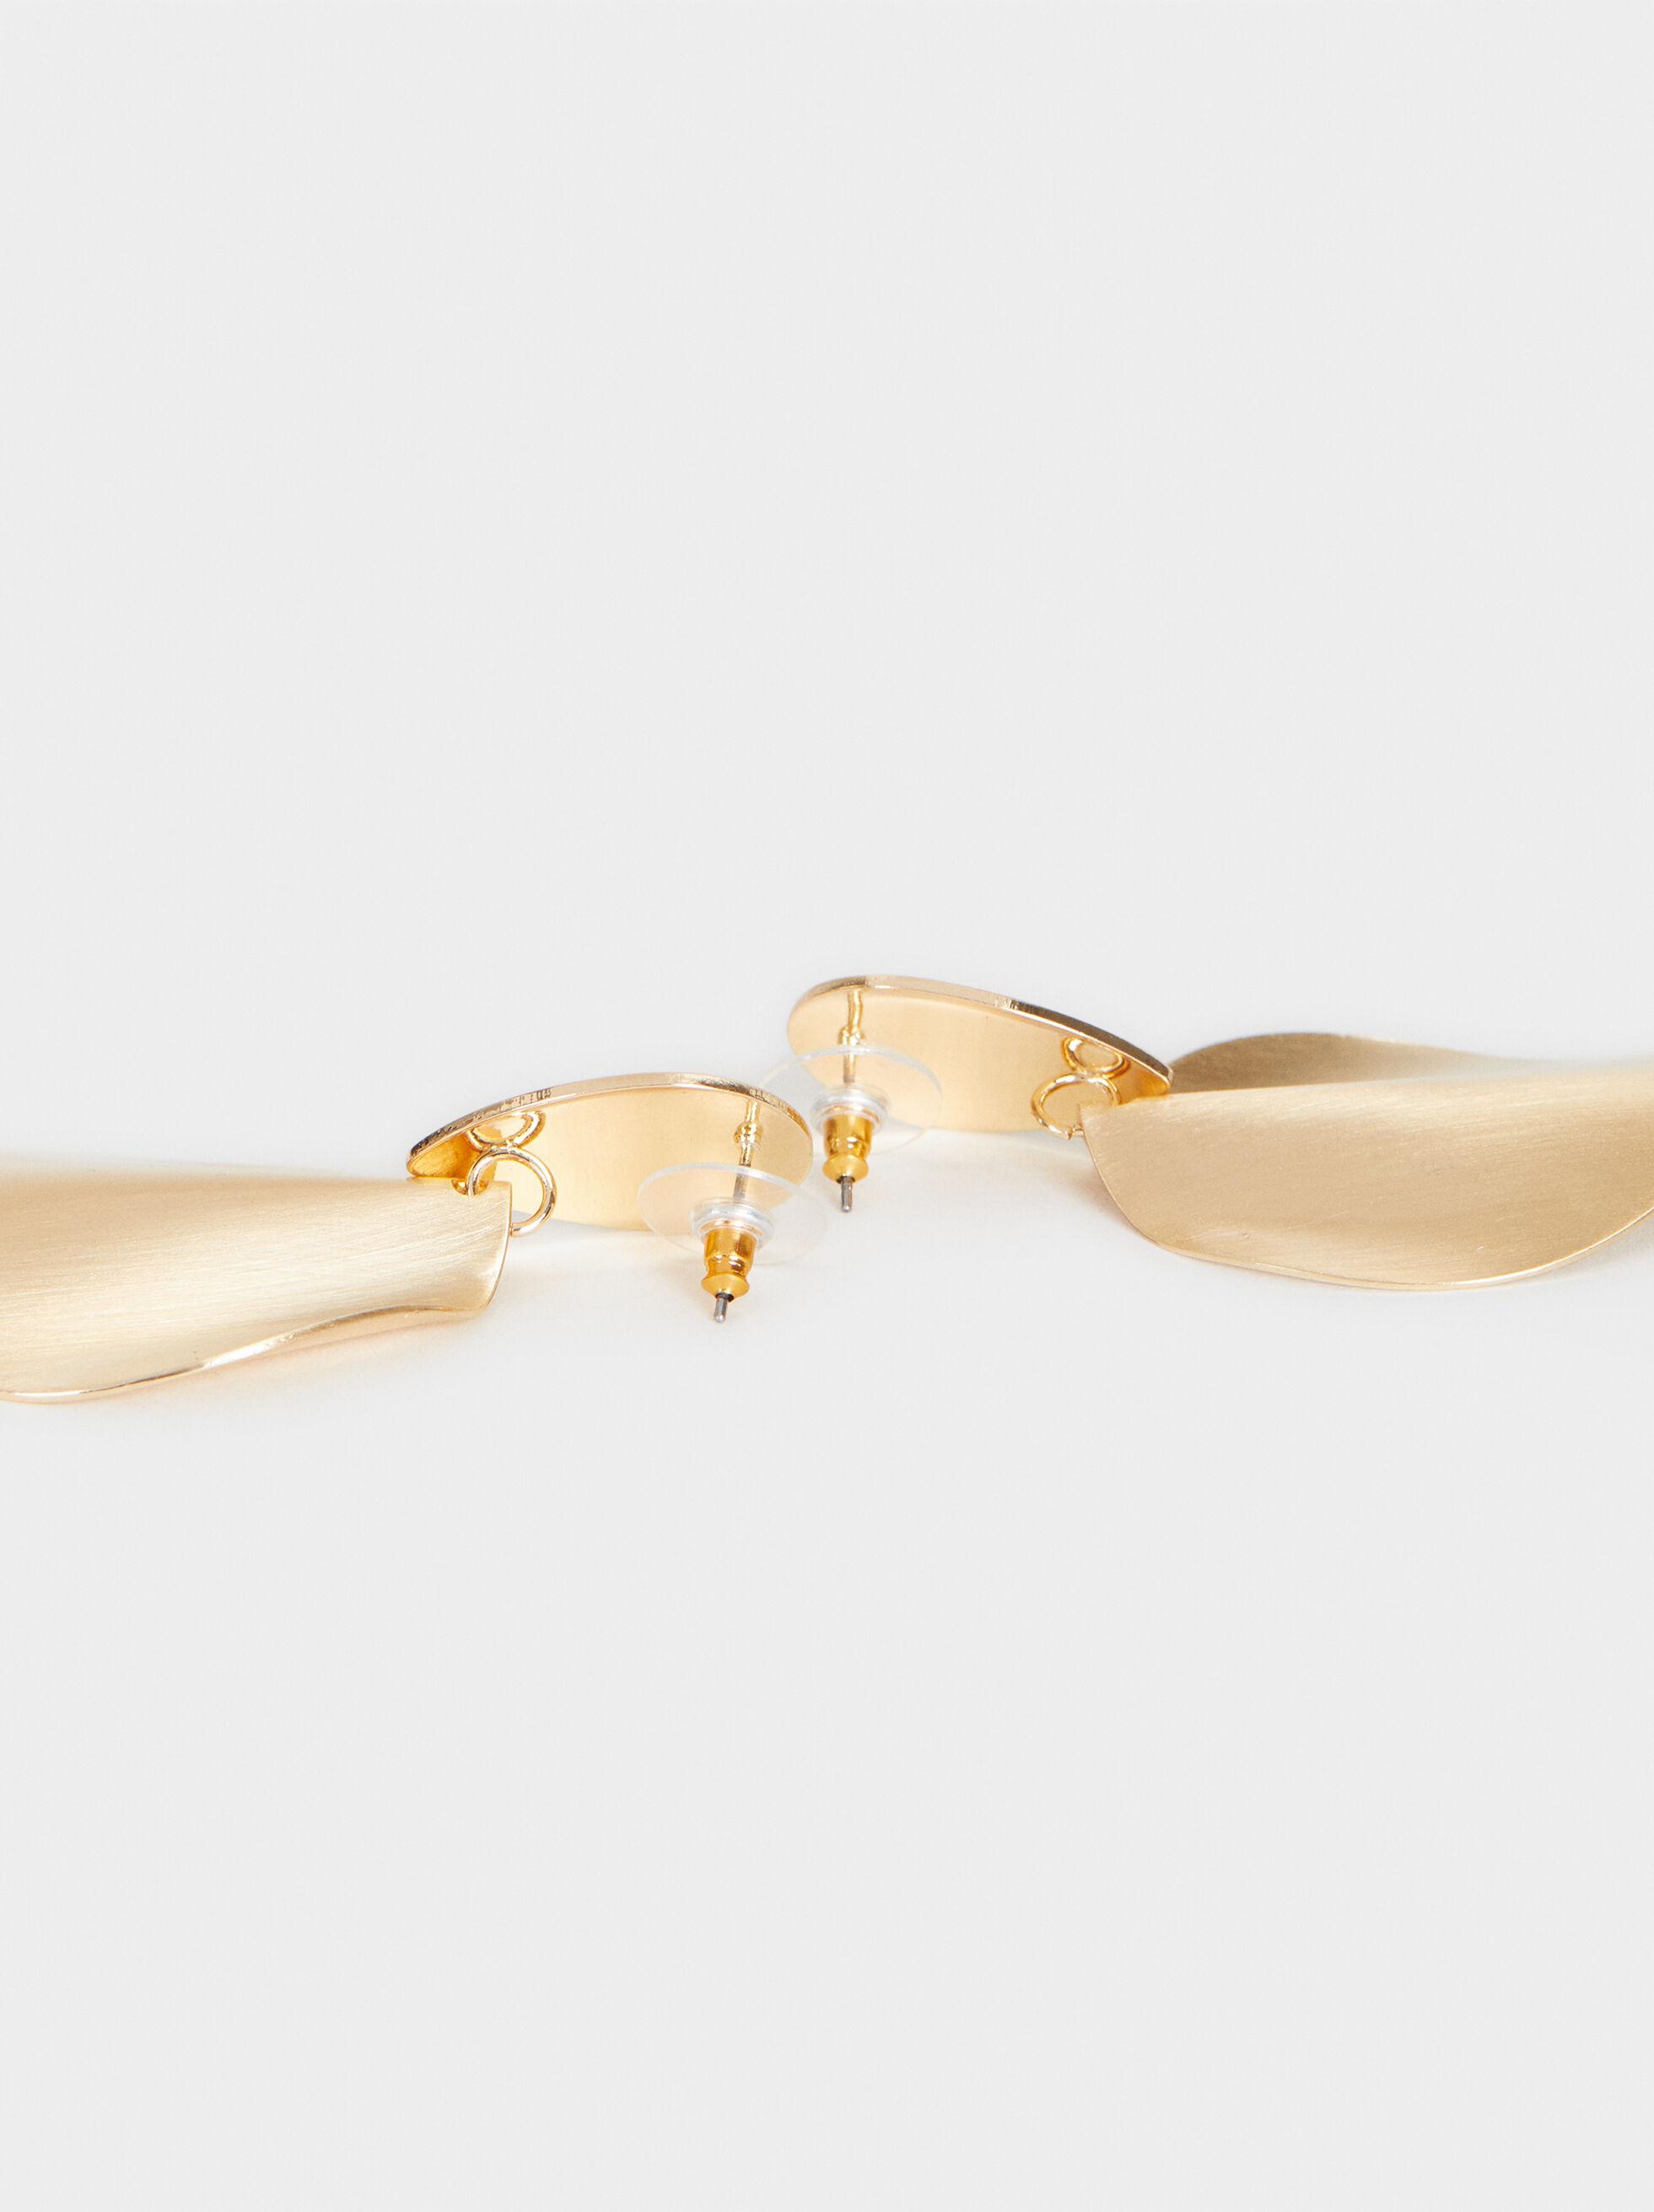 Medium Gold-Finish Earrings, Golden, hi-res